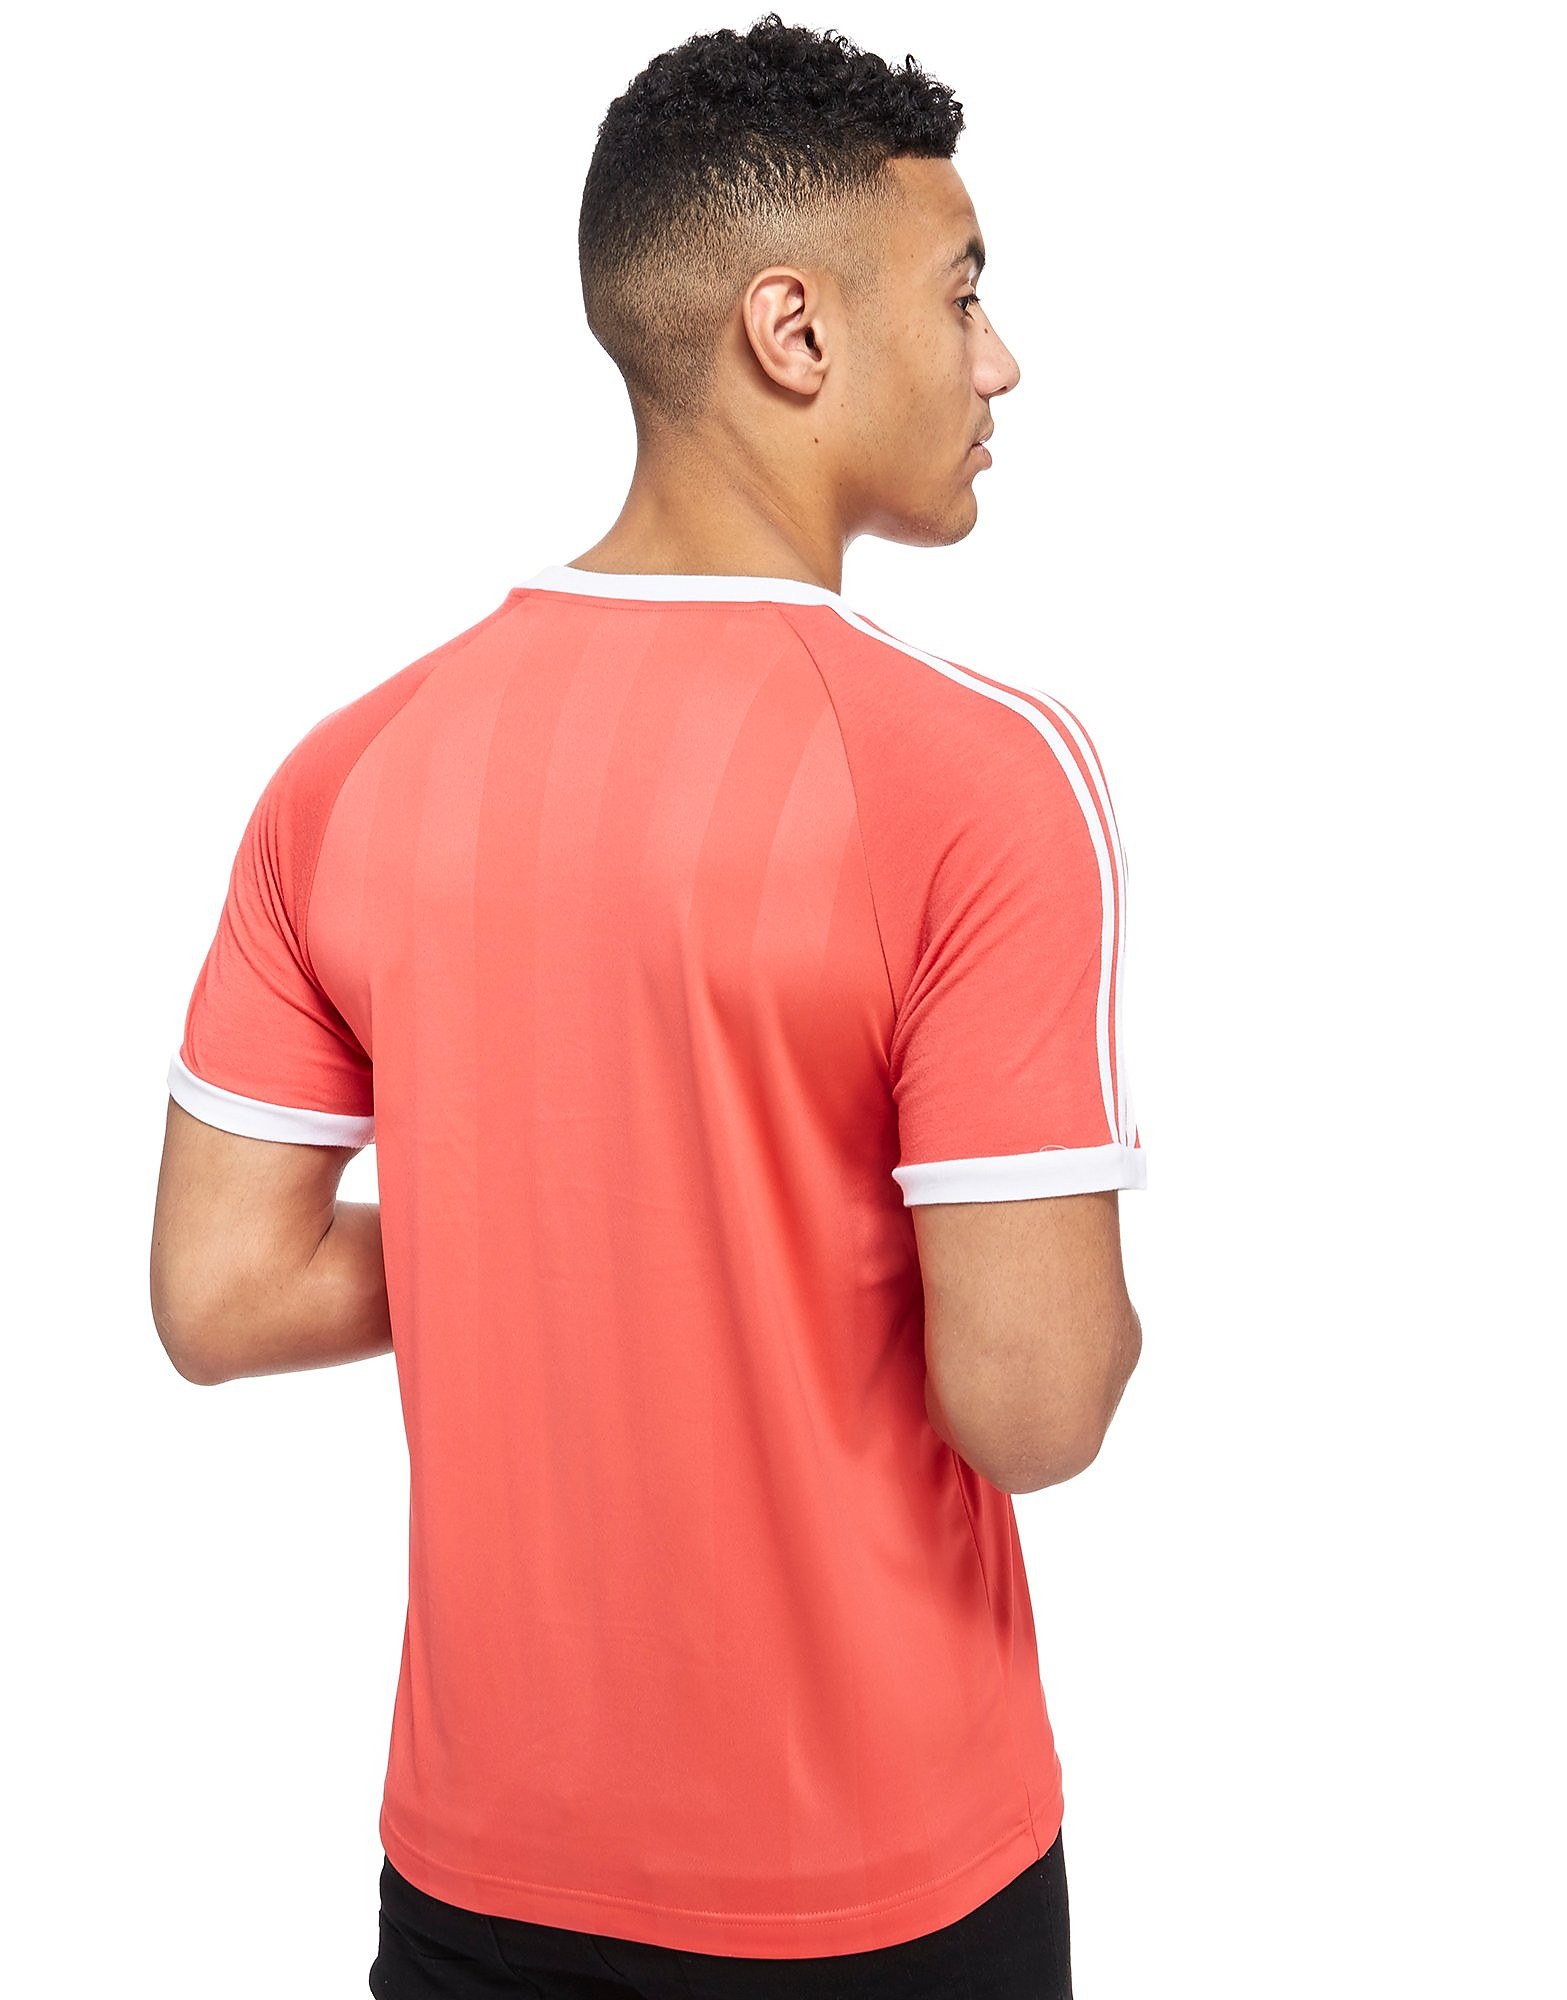 adidas Originals California Trefoil T-Shirt